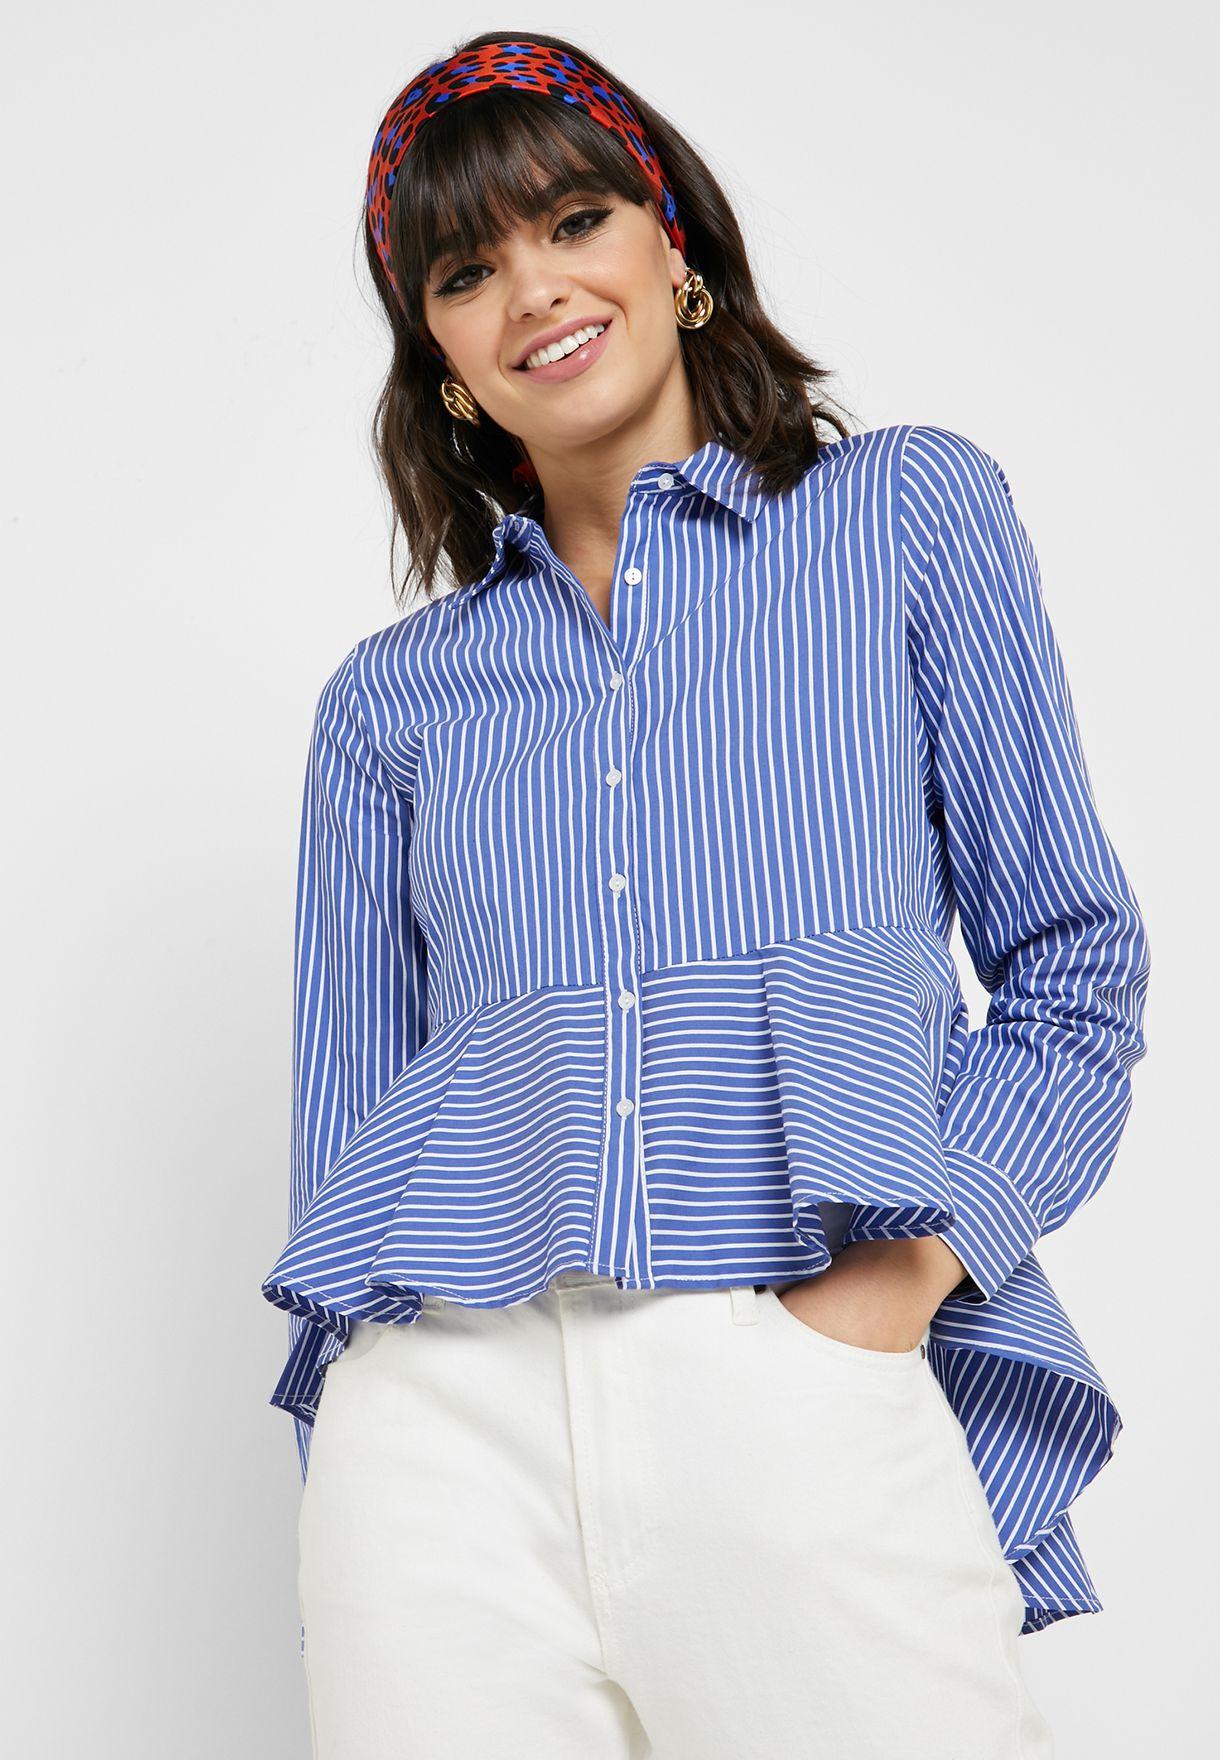 731b423179439 Shop Koton prints Striped Peplum Shirt 9YAK63386EW for Women in ...